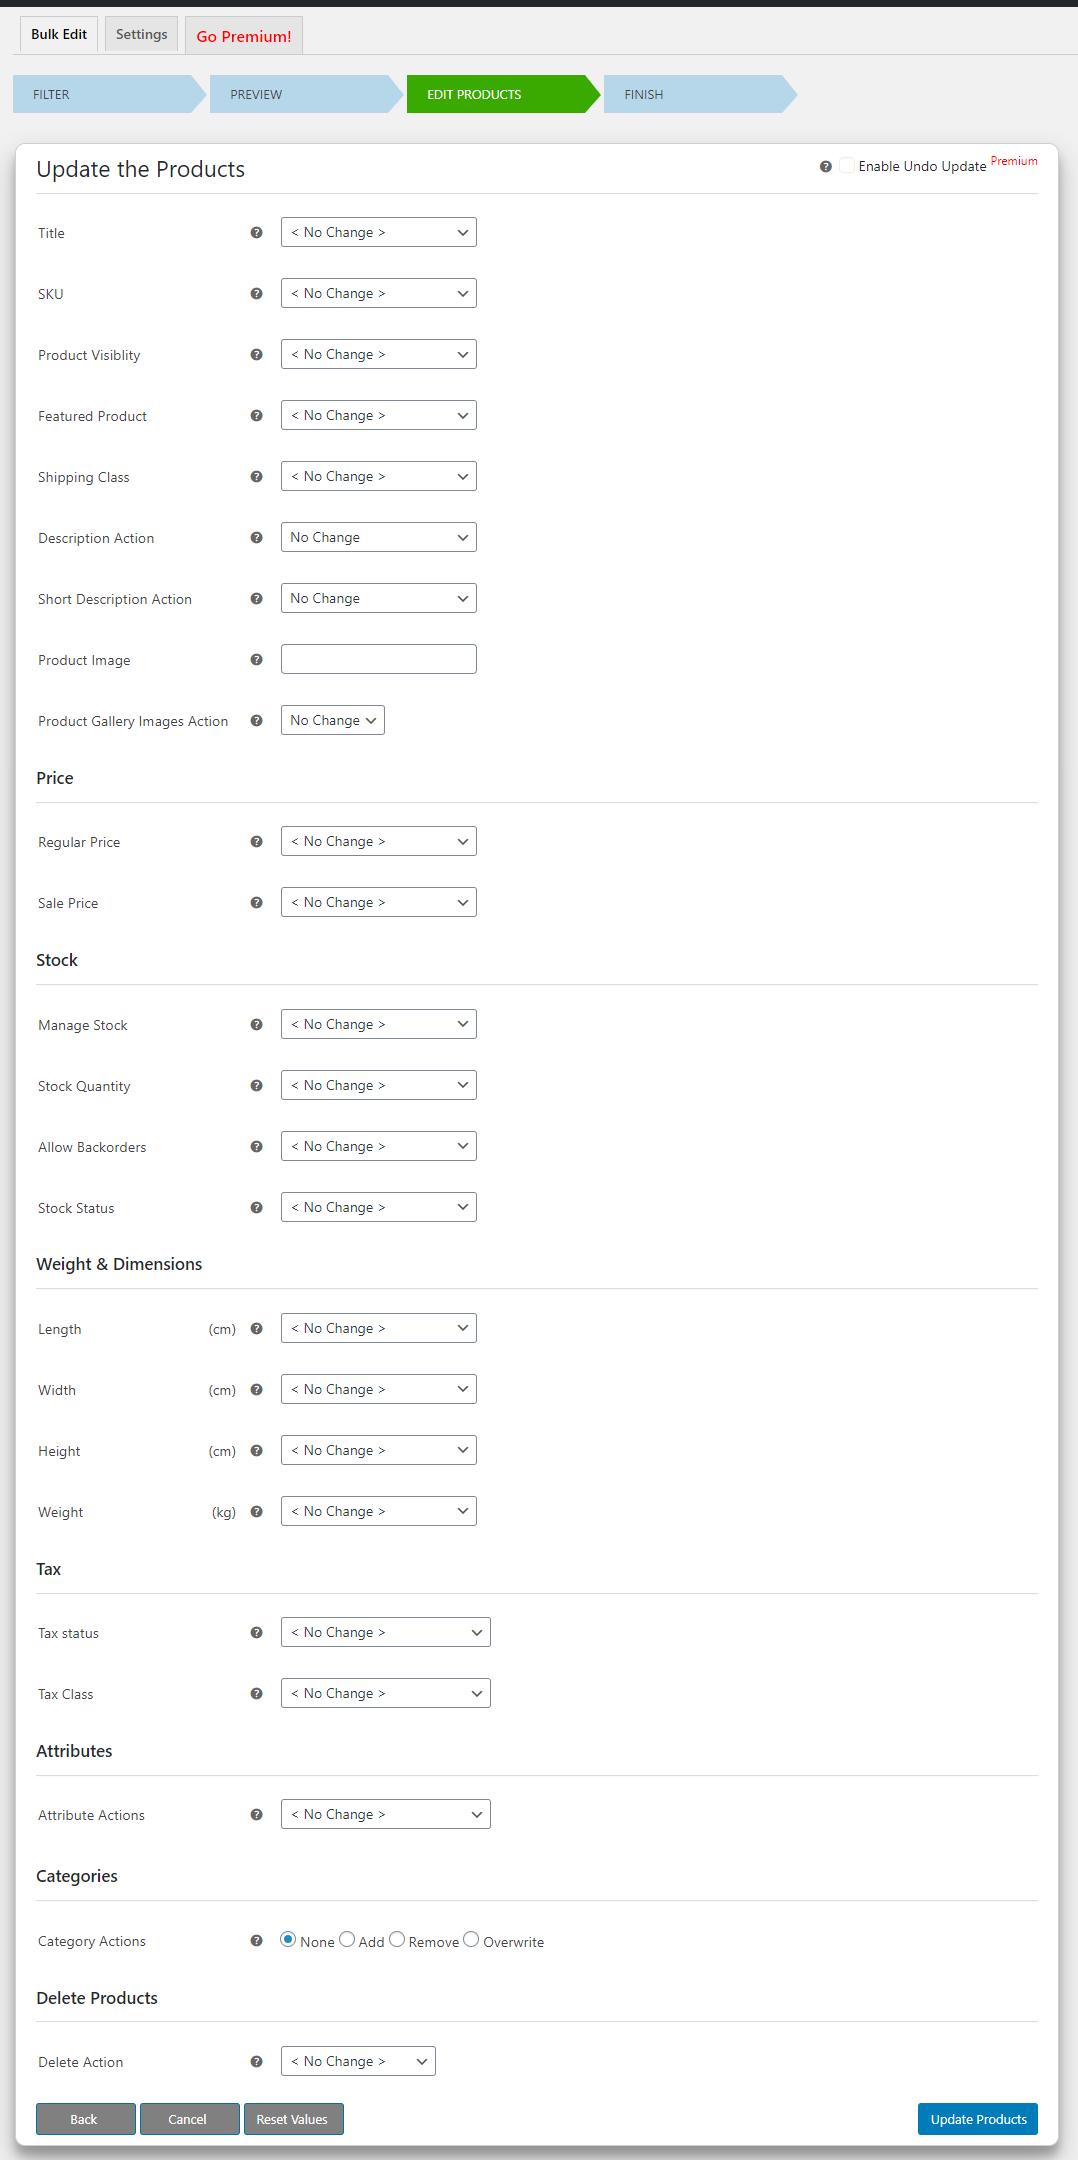 How to Bulk Edit WooCommerce Products - Elex WooCommerce Advanced Bulk Edit - Edit products